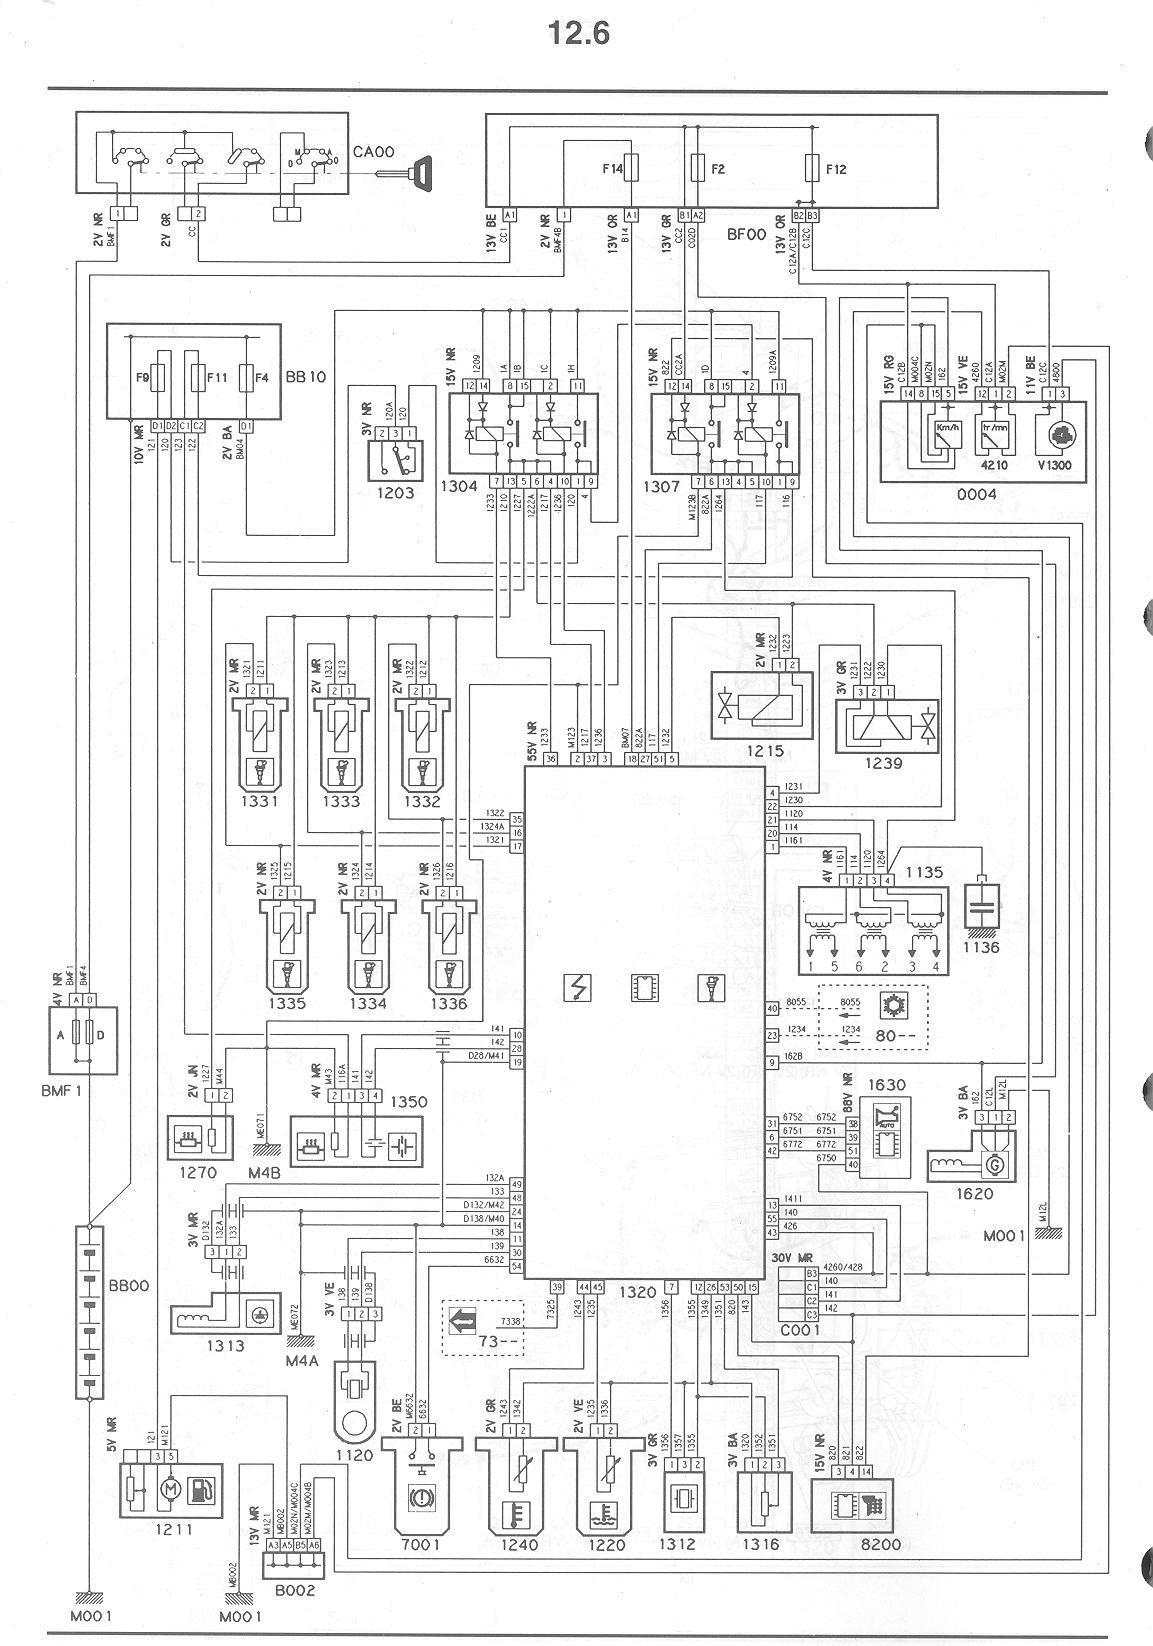 citroen c5 tailgate wiring diagram 2004 volvo xc90 stereo wiper schematic free a2